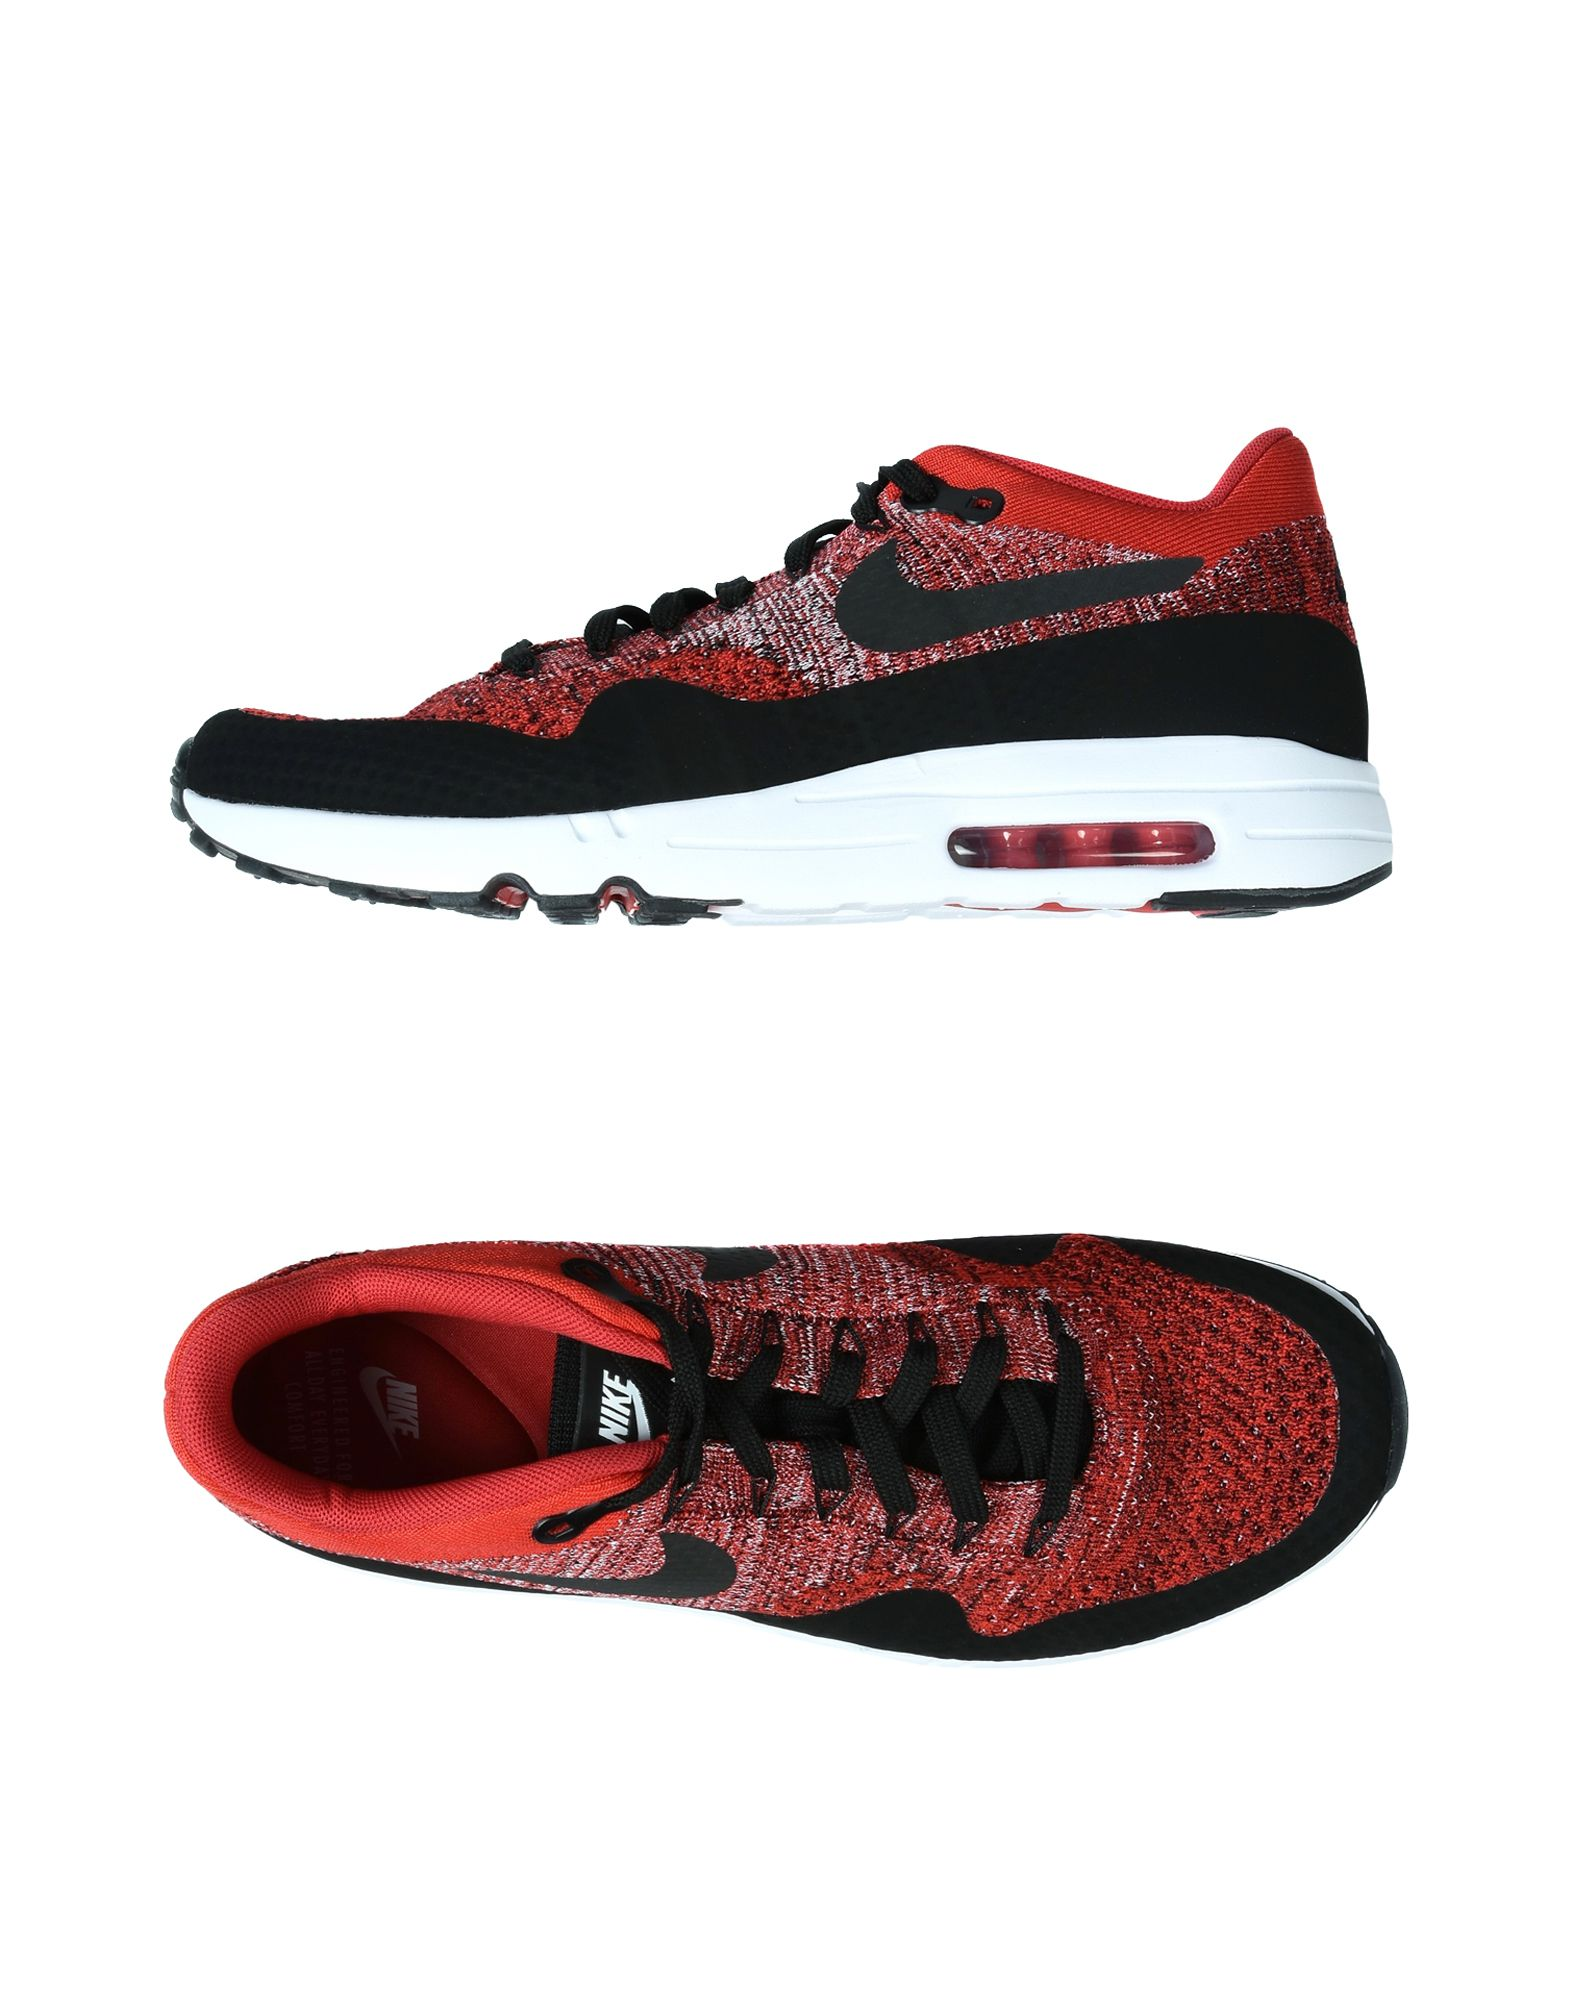 Sneakers Nike Air Max 1 Ultra 2.0 Flyknit - Uomo - Acquista online su